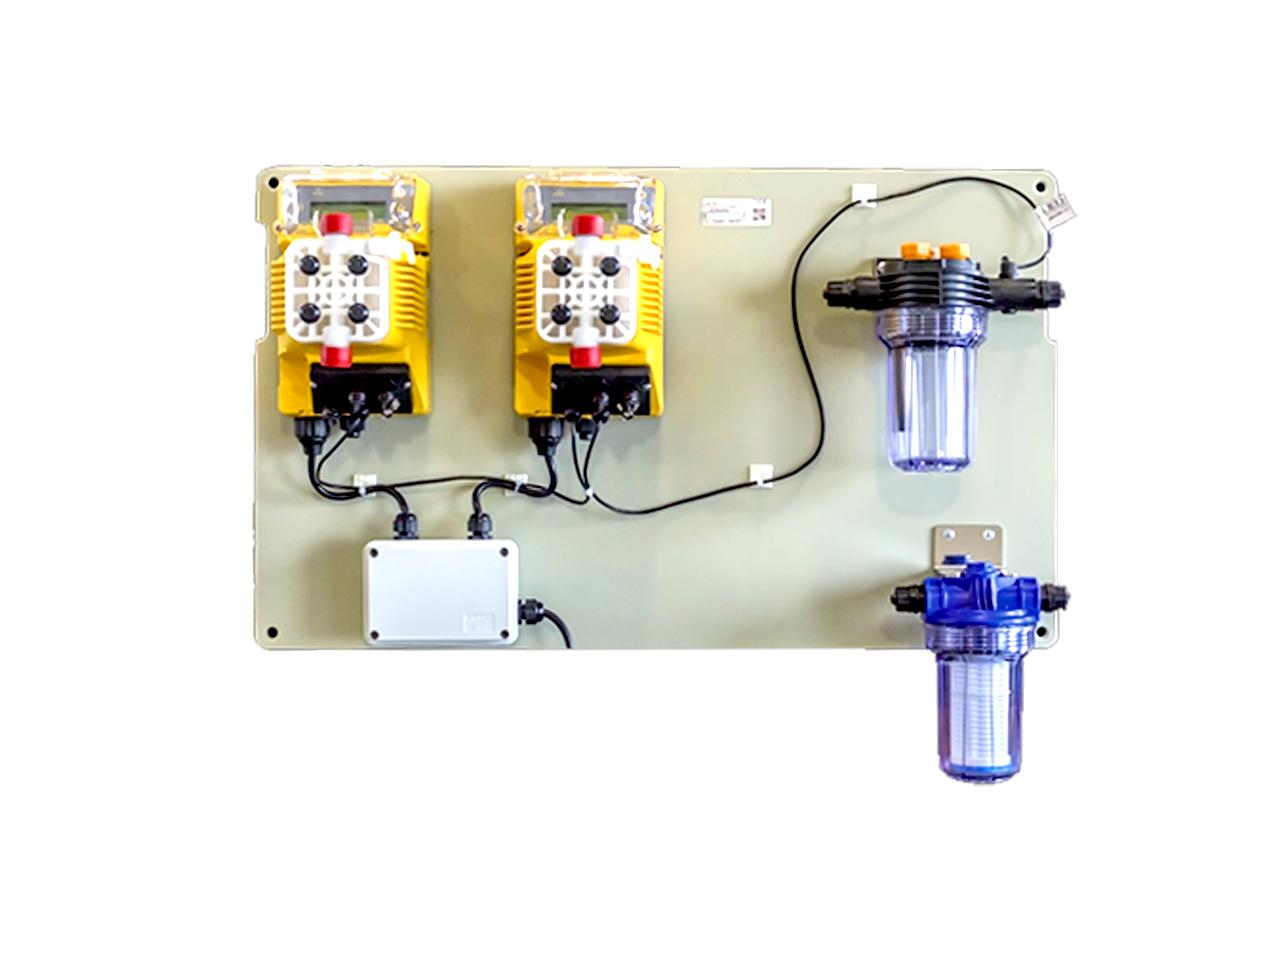 ERCA SAS helios1-panel-digital Sistemas de control automático - Serie Helios